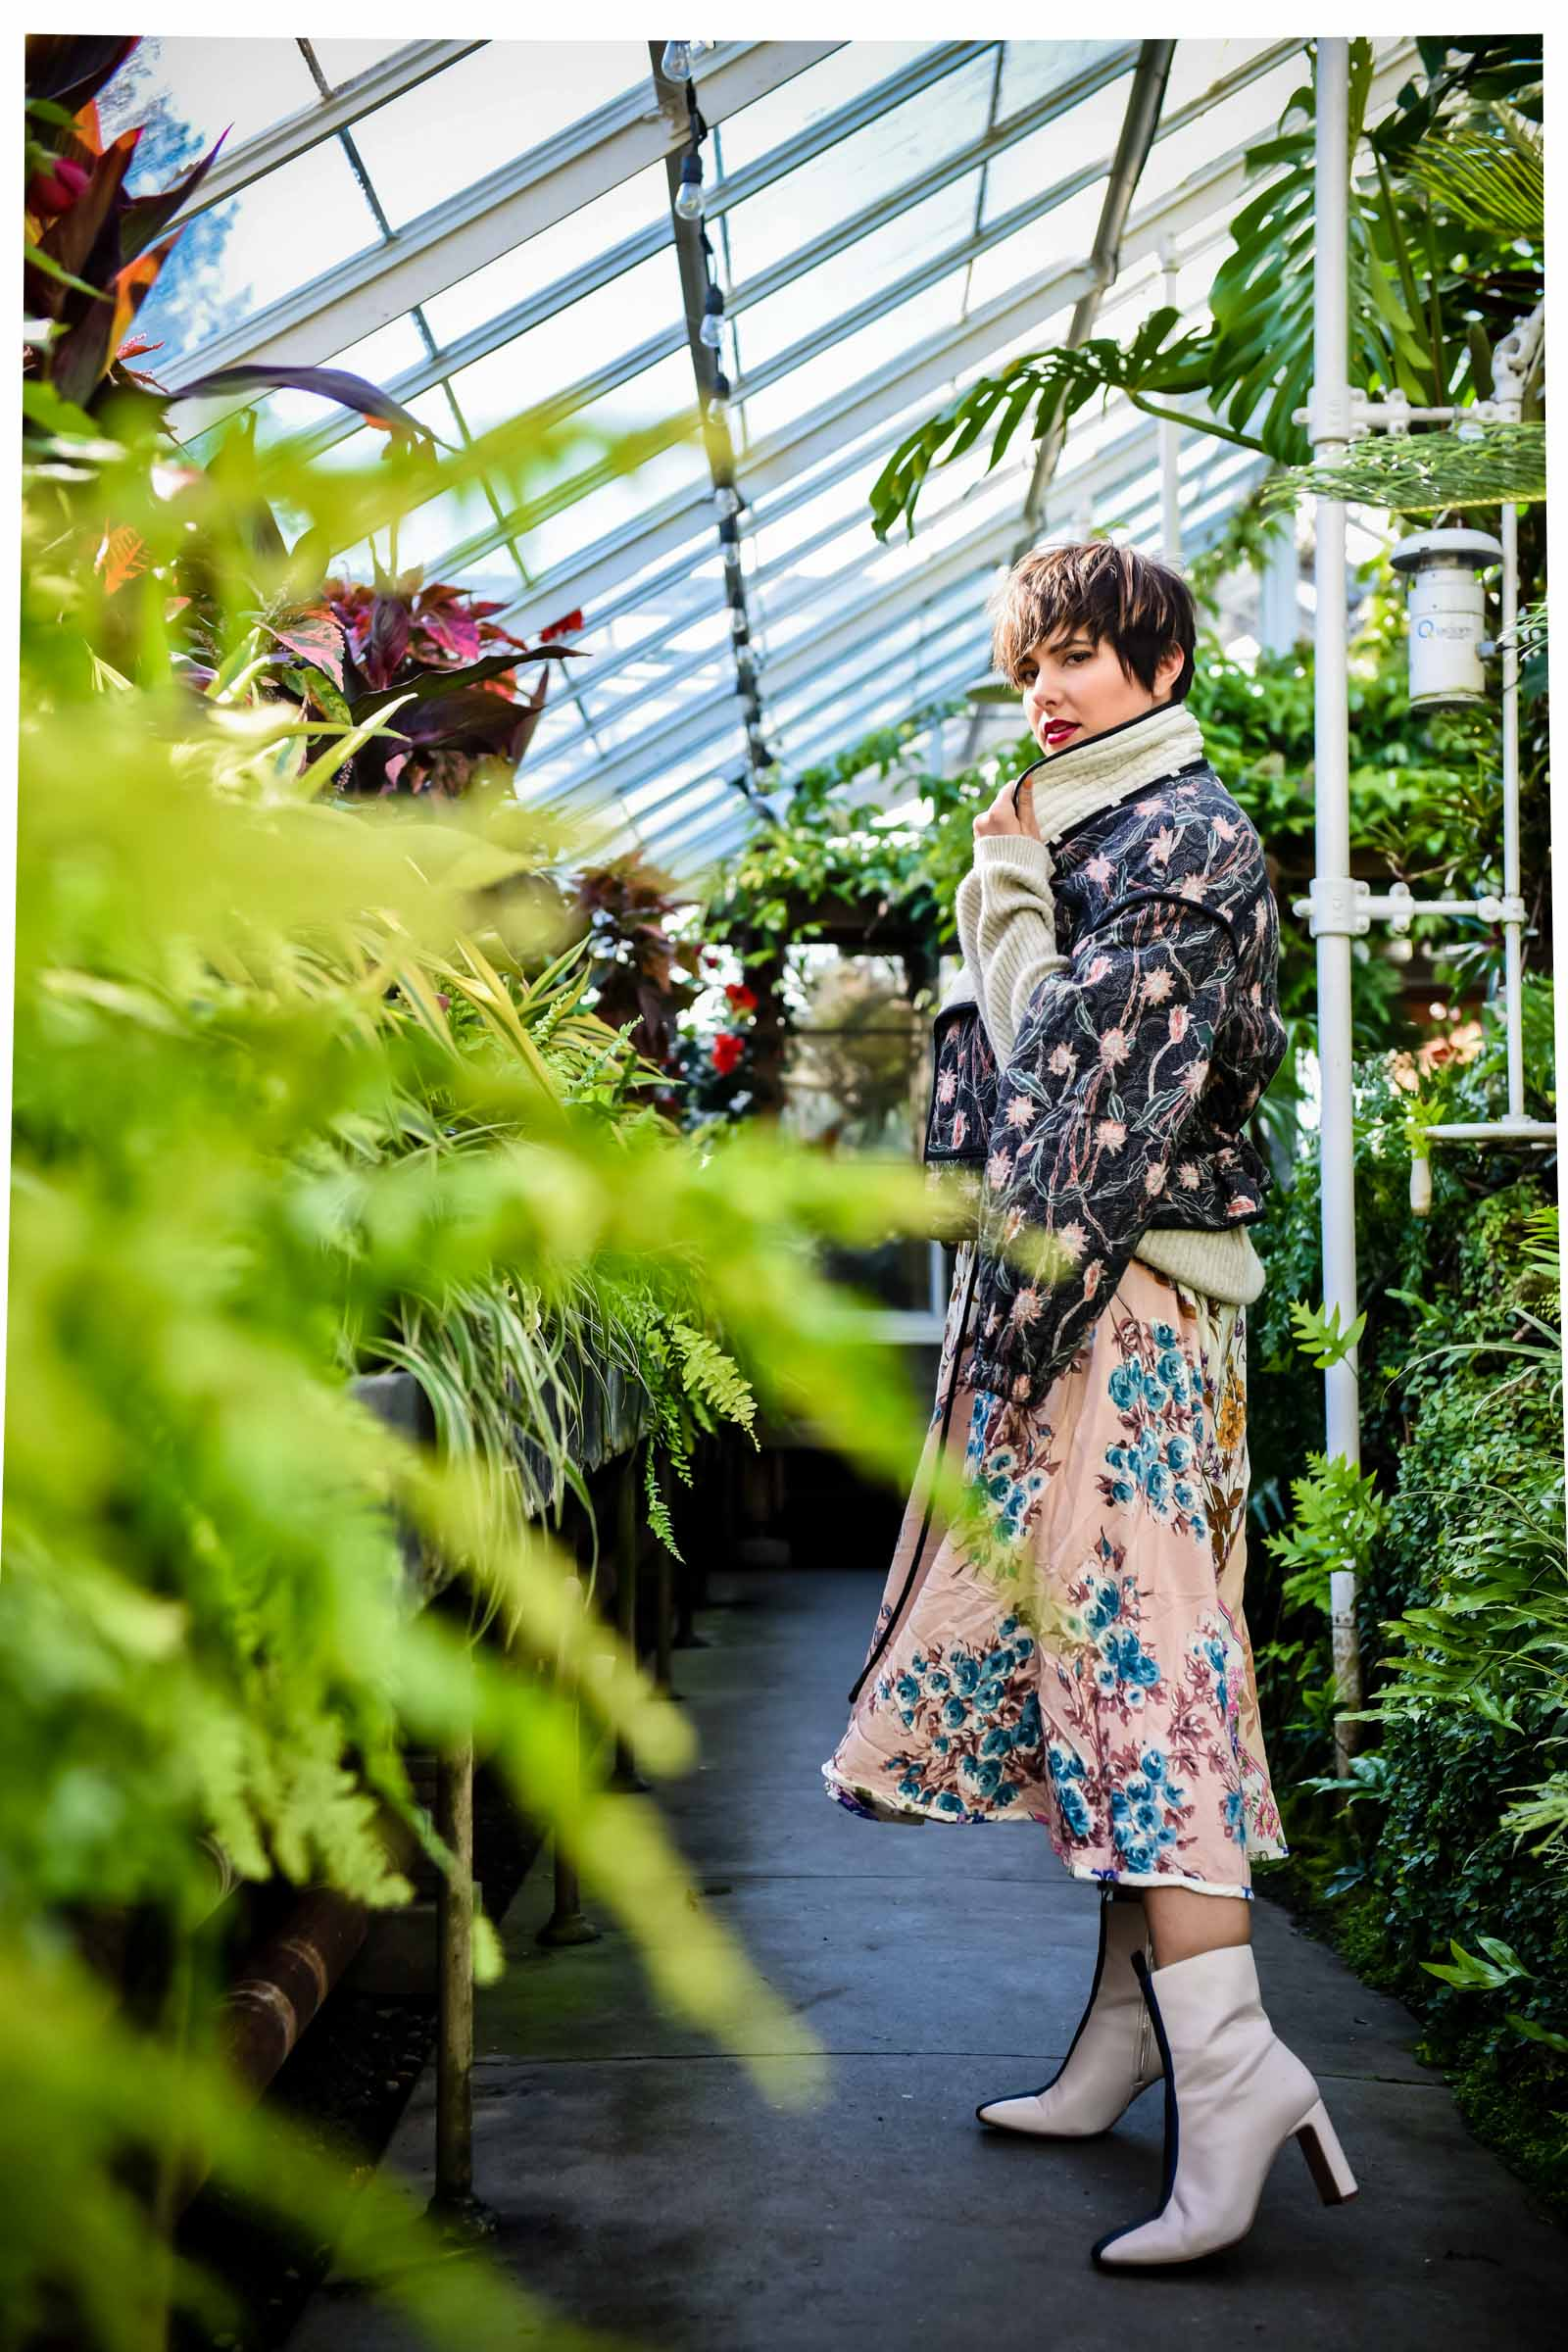 Next Level Winter Layers: Moody Florals -BloggerNotBillionaire.com